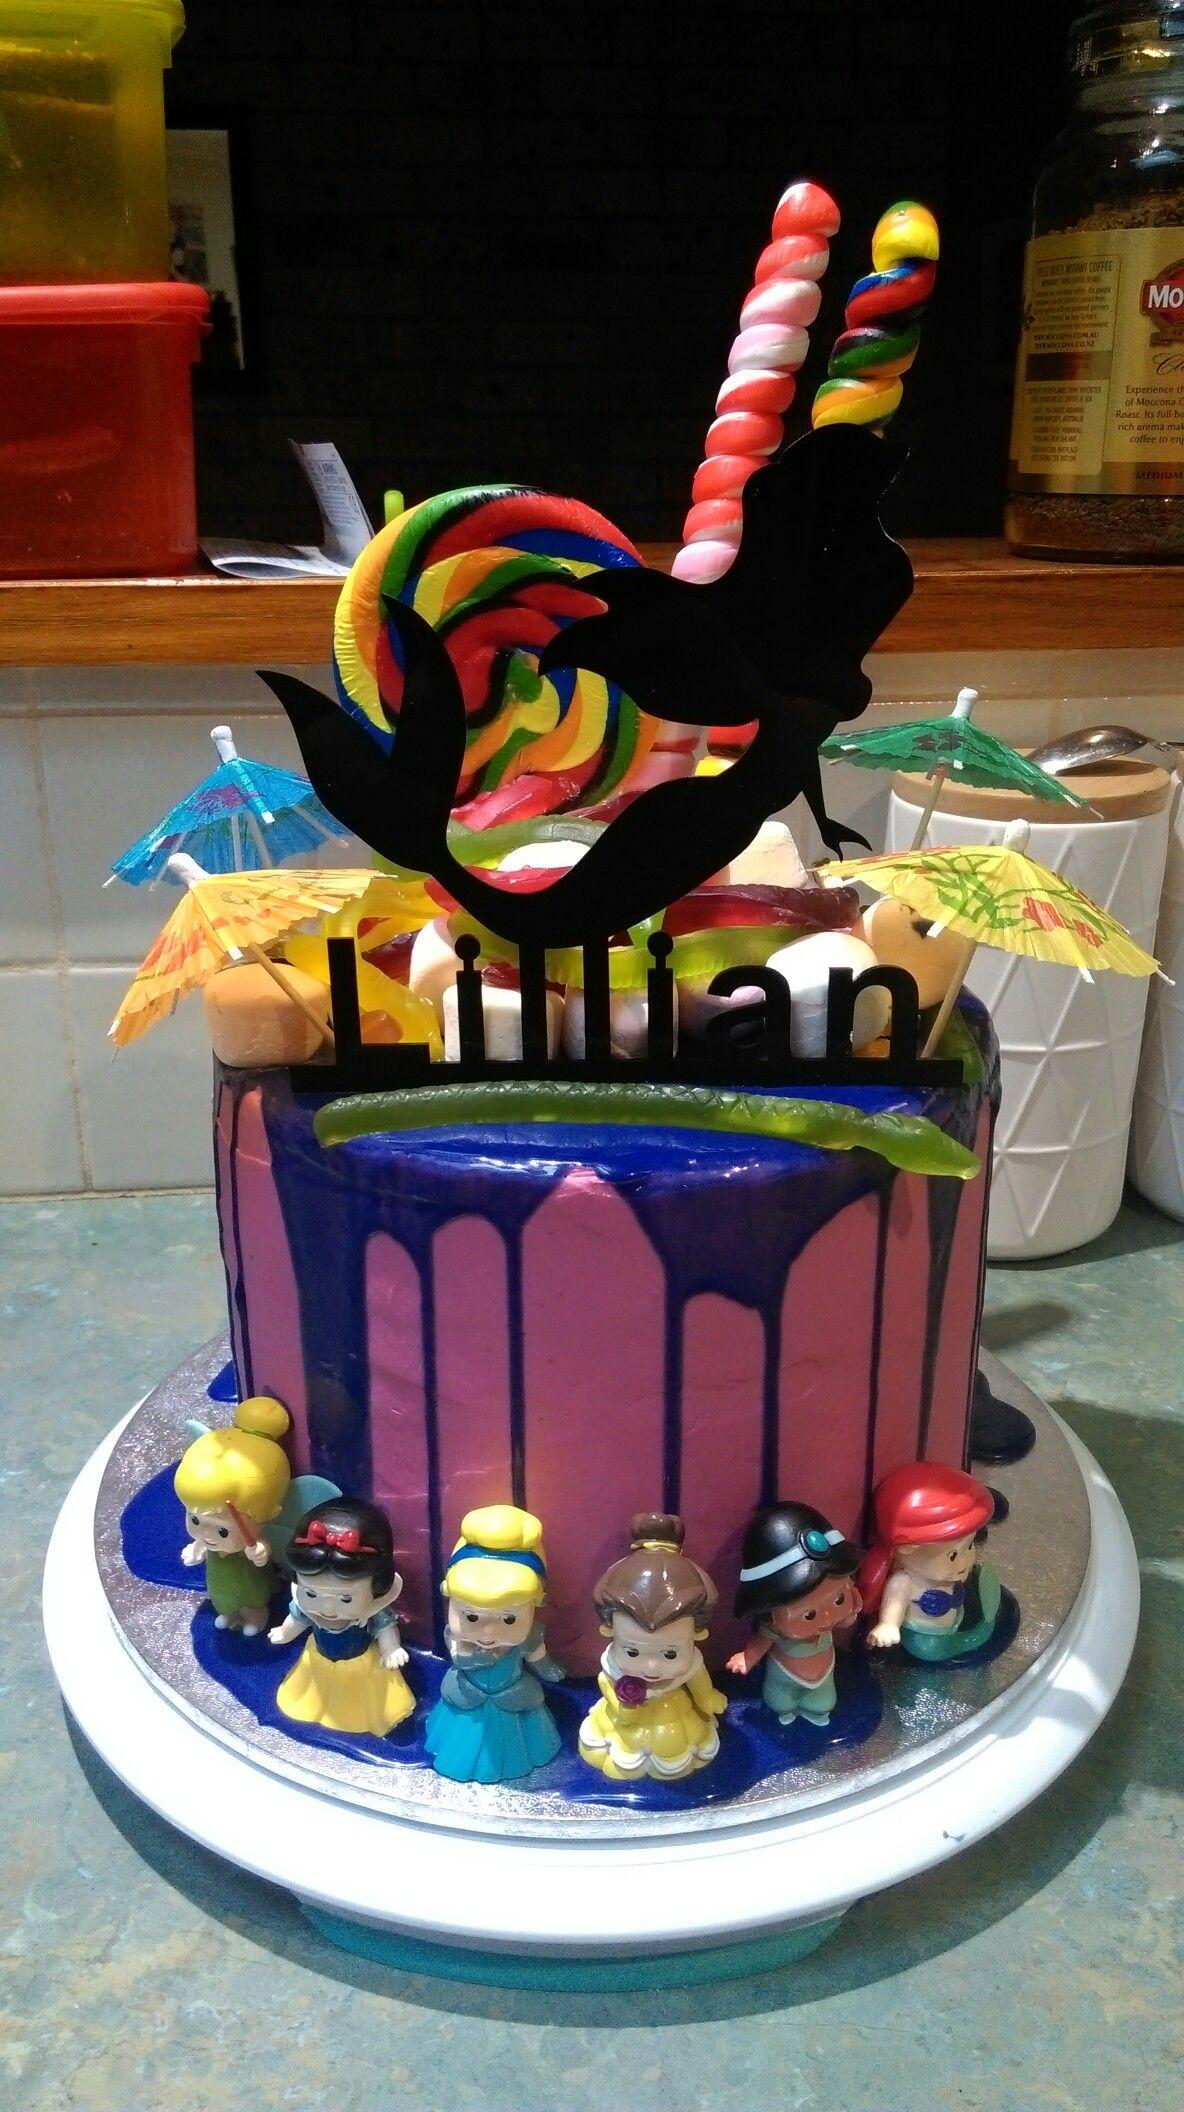 Lillian 5th birthday candy princess cake princess cake